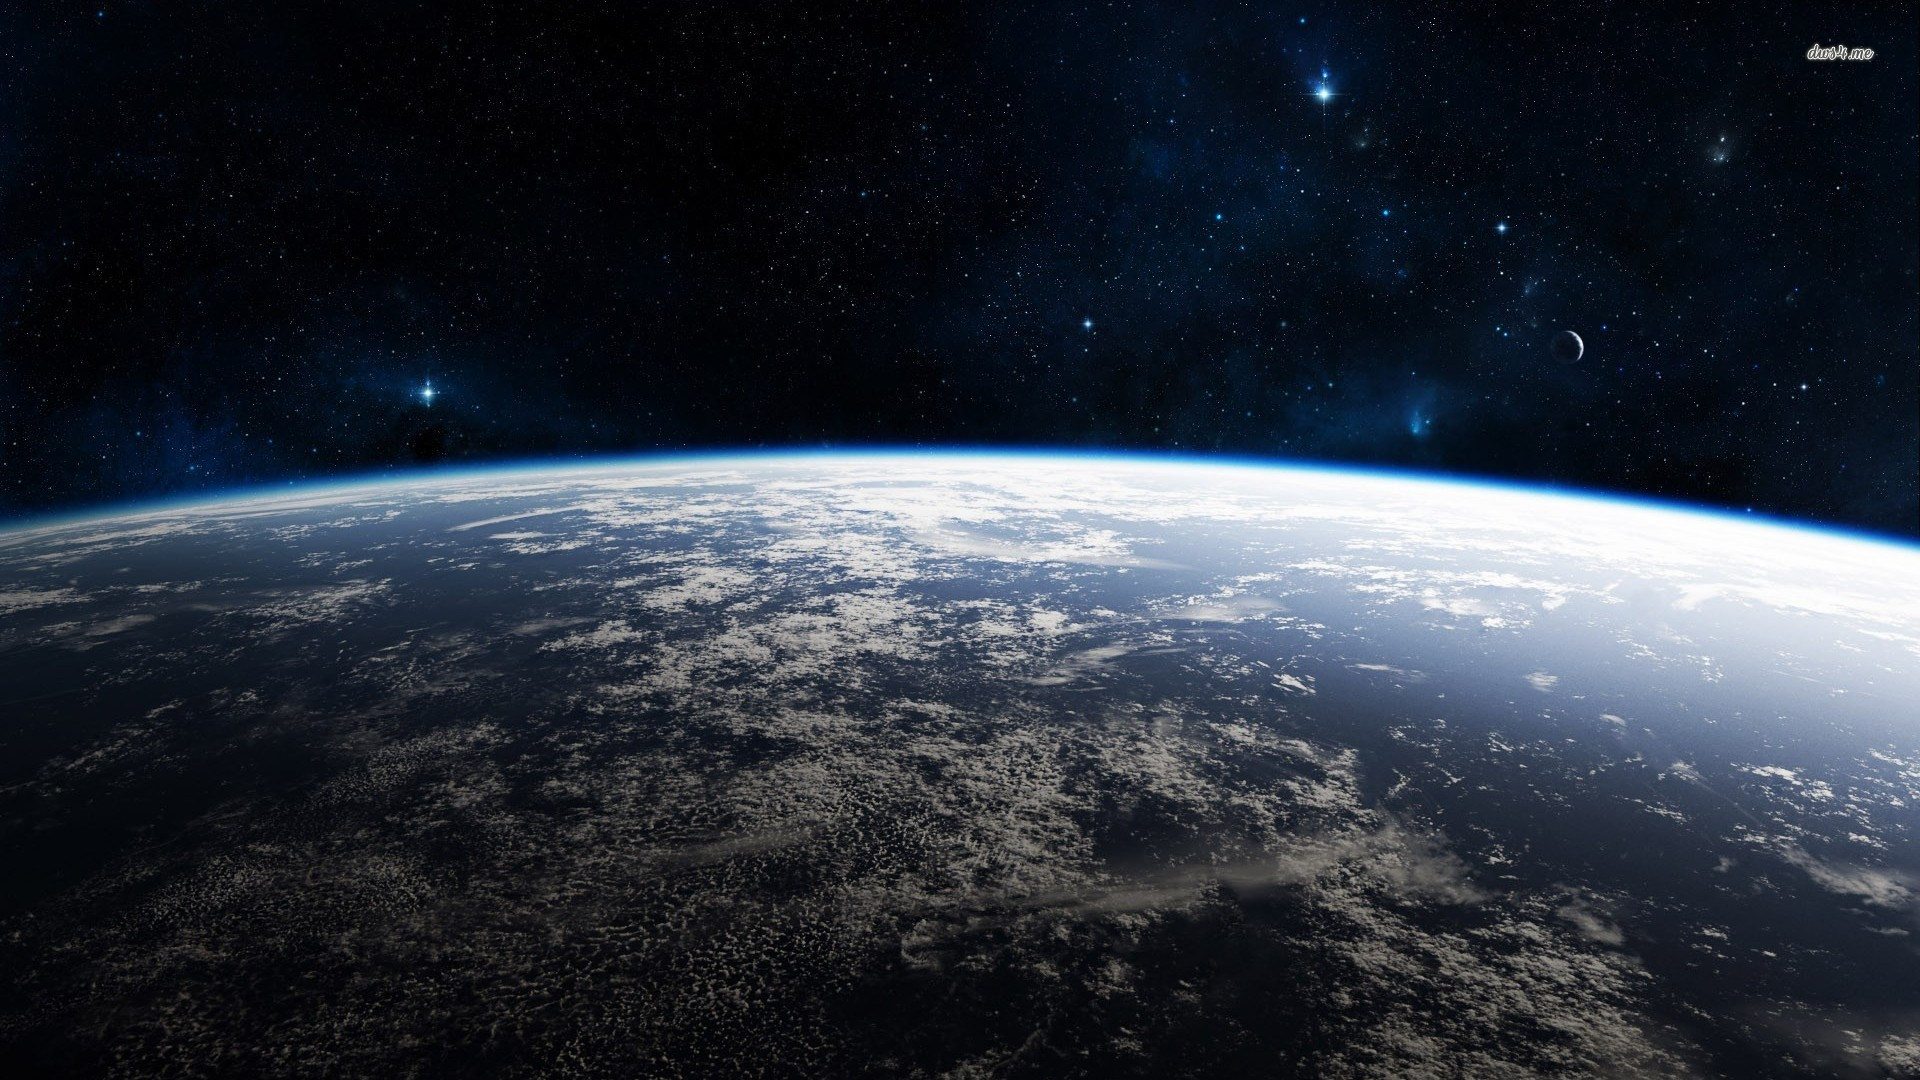 earth from space hd wallpaper wallpapersafari